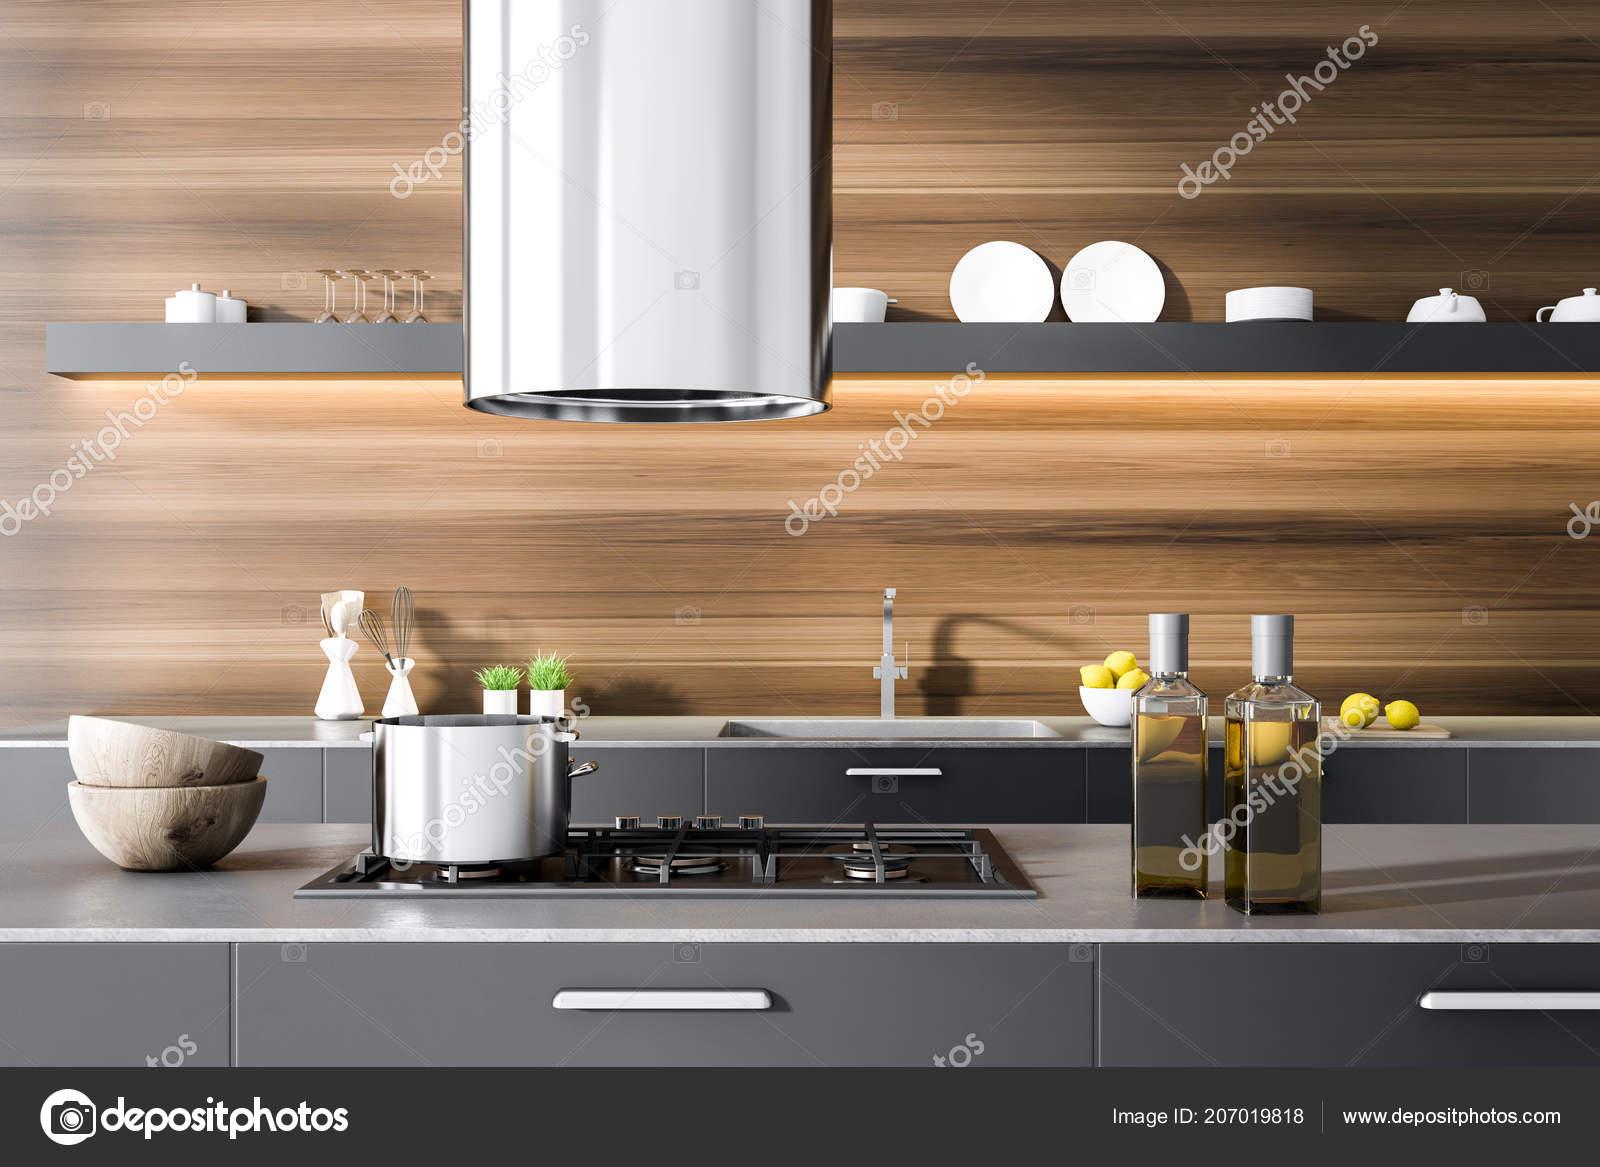 grey kitchen countertops table sets cheap 灰色厨房台面与炊具和瓶子在一个黑暗的木制厨房内部在背景中有盘子的长 灰色厨房台面与炊具和瓶子在一个黑暗的木制厨房内部在